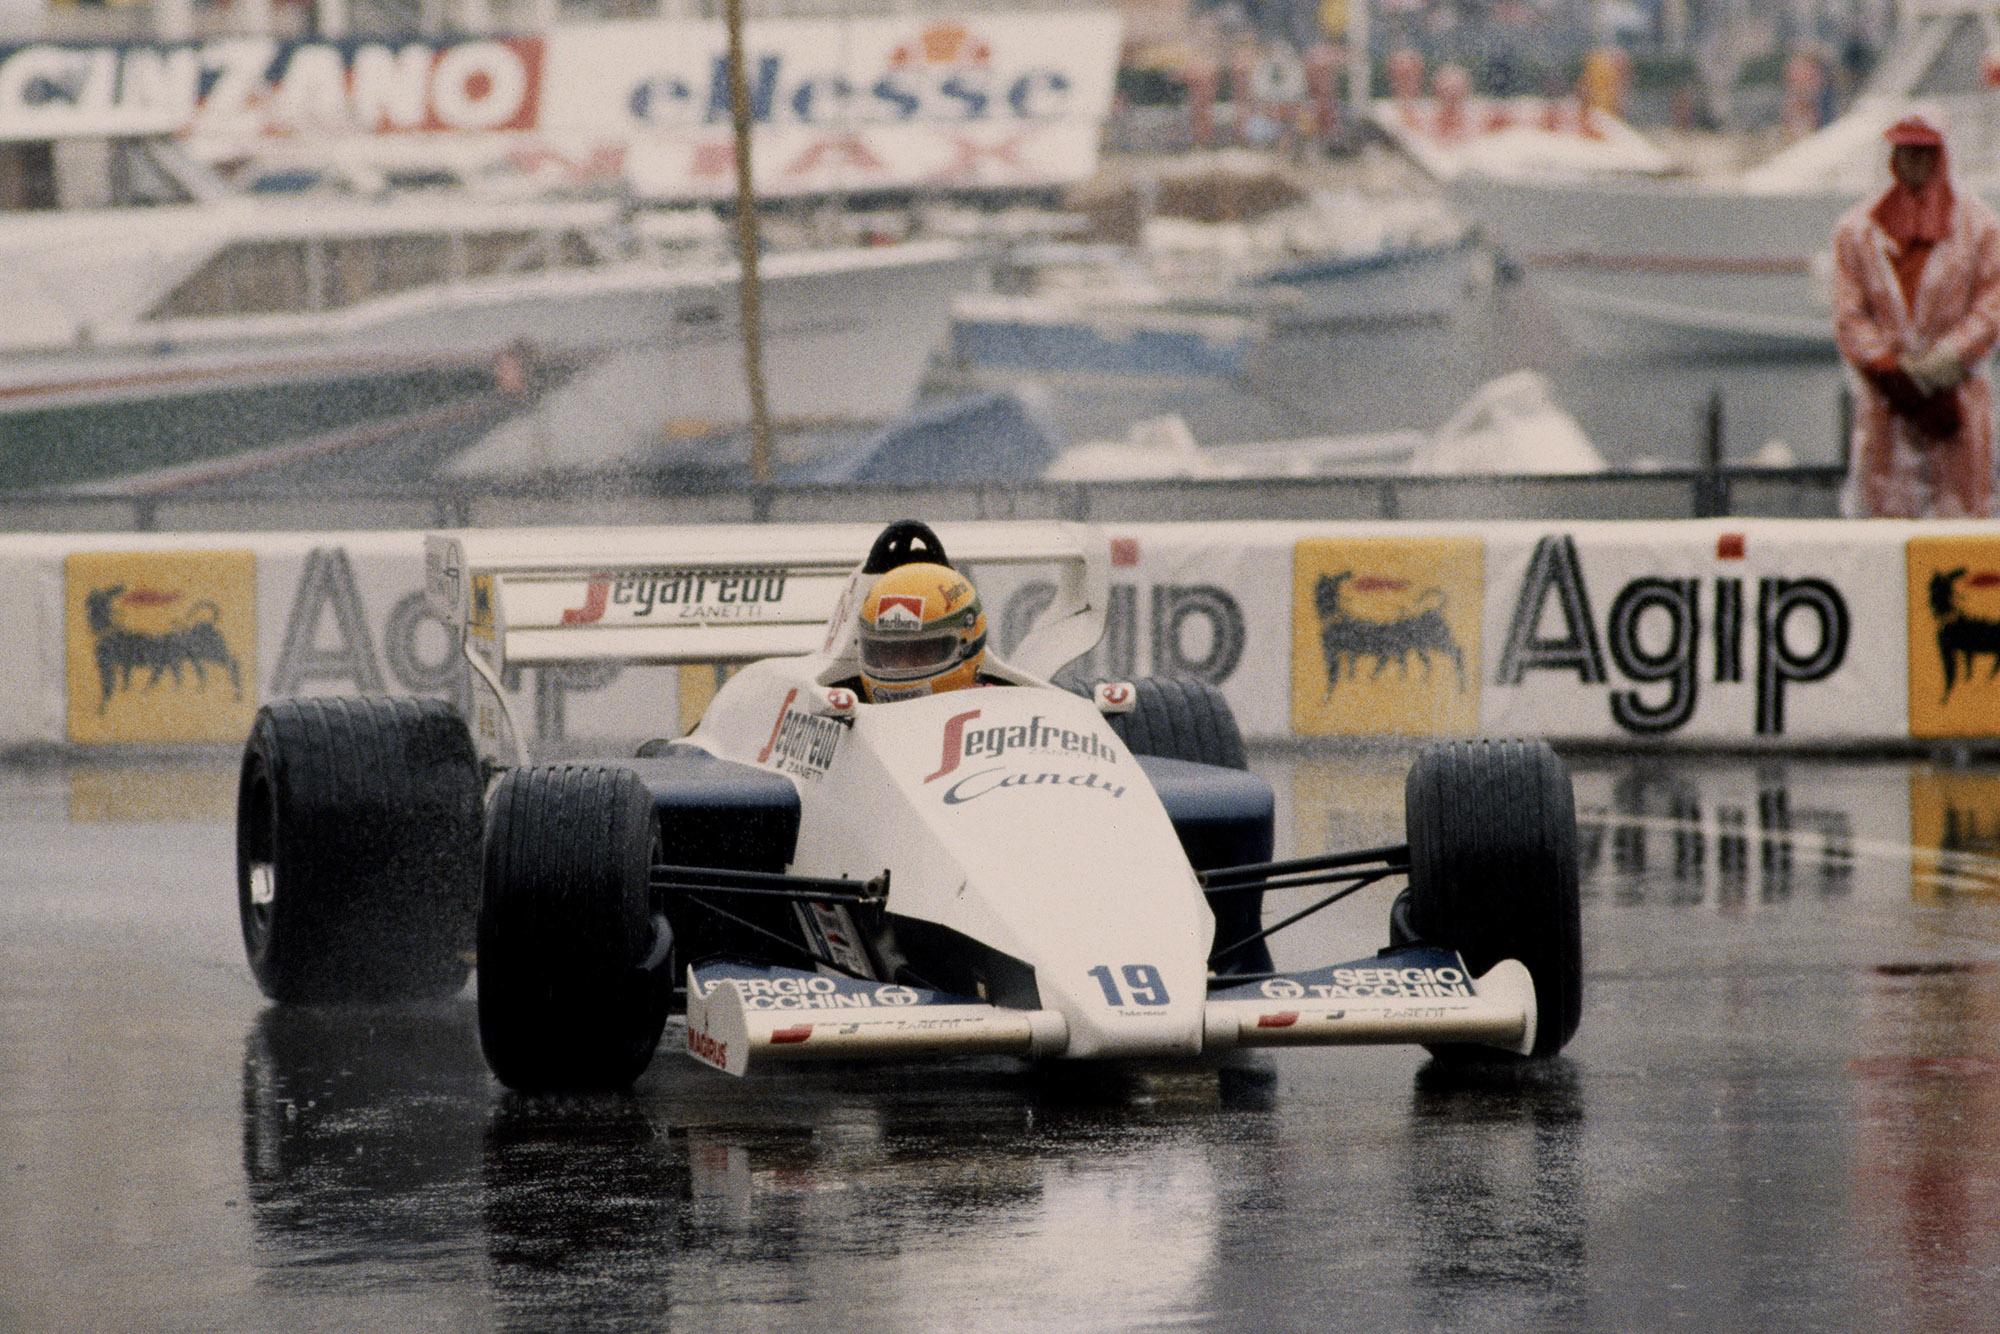 Ayrton Senna during the 1984 Monaco Grand Prix